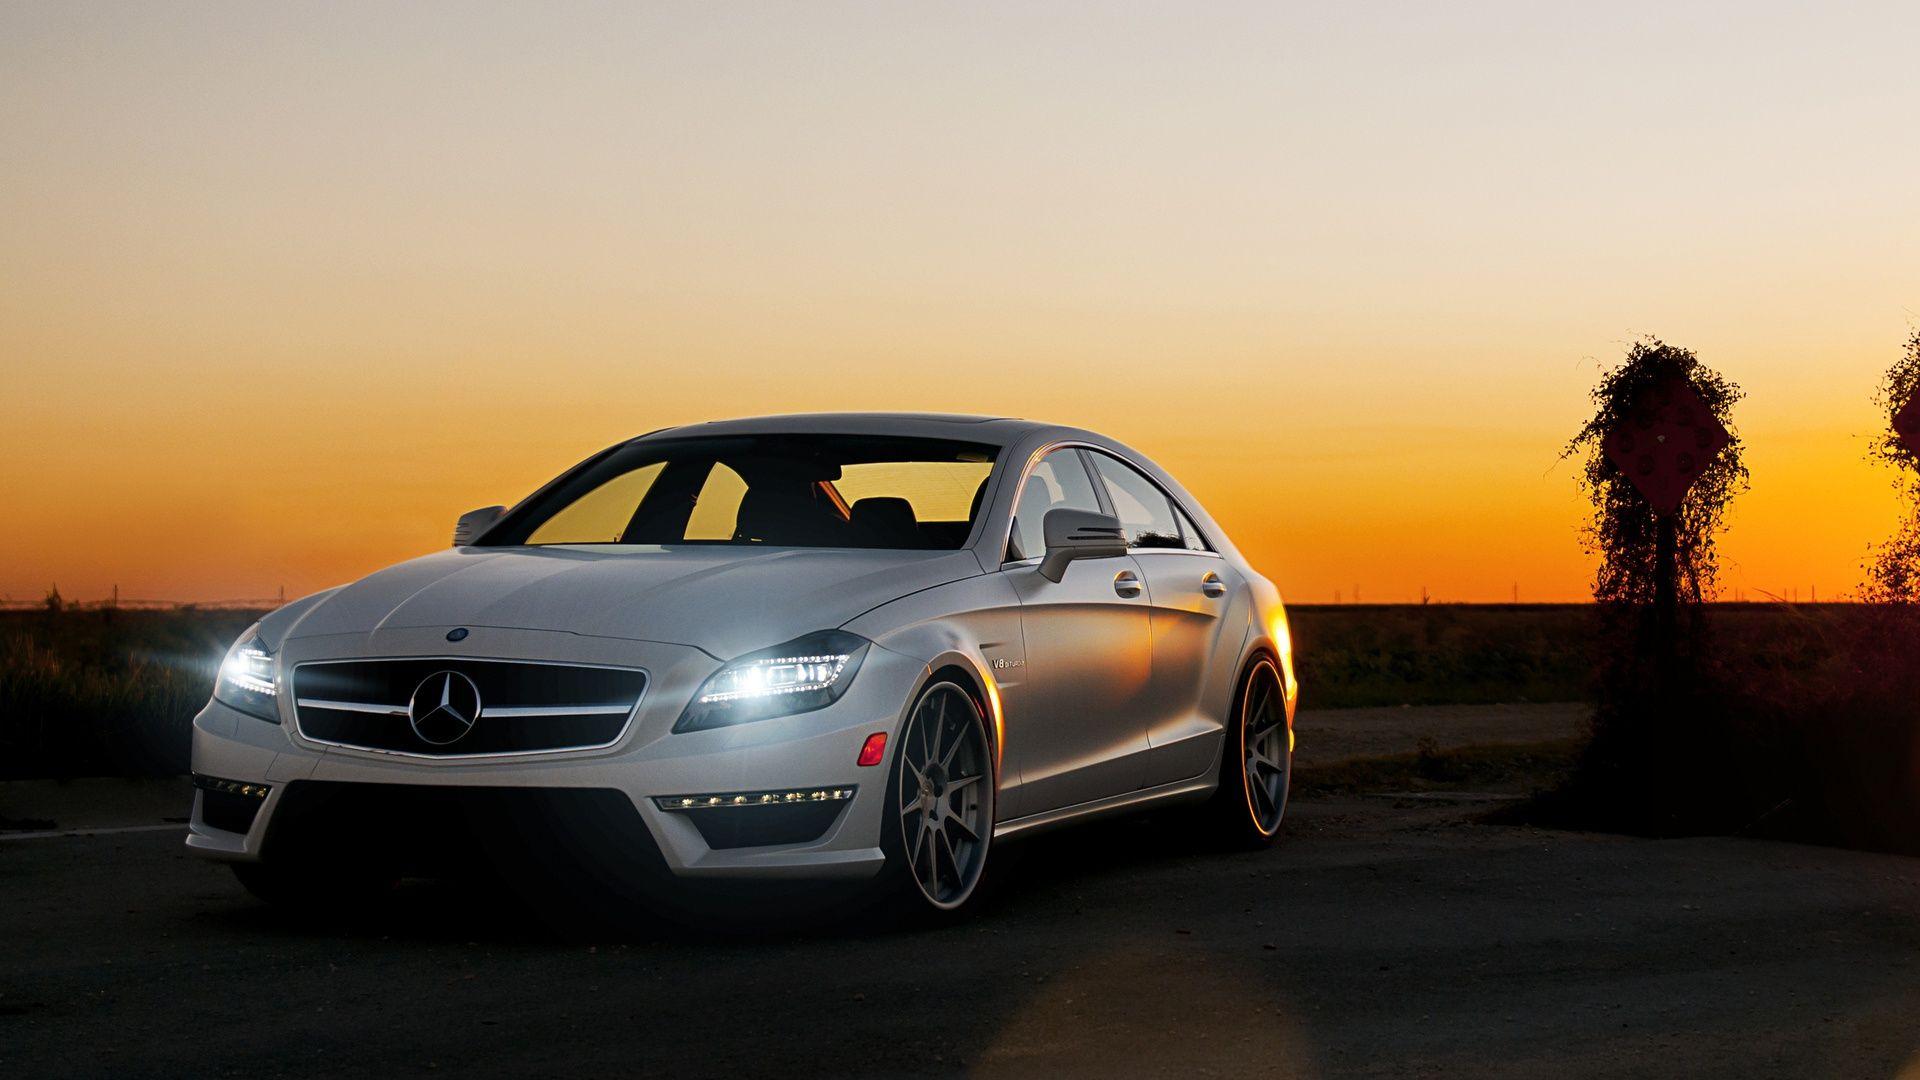 Mykonos Private Driver Chauffeured Car Rental Luxury Cars Vip